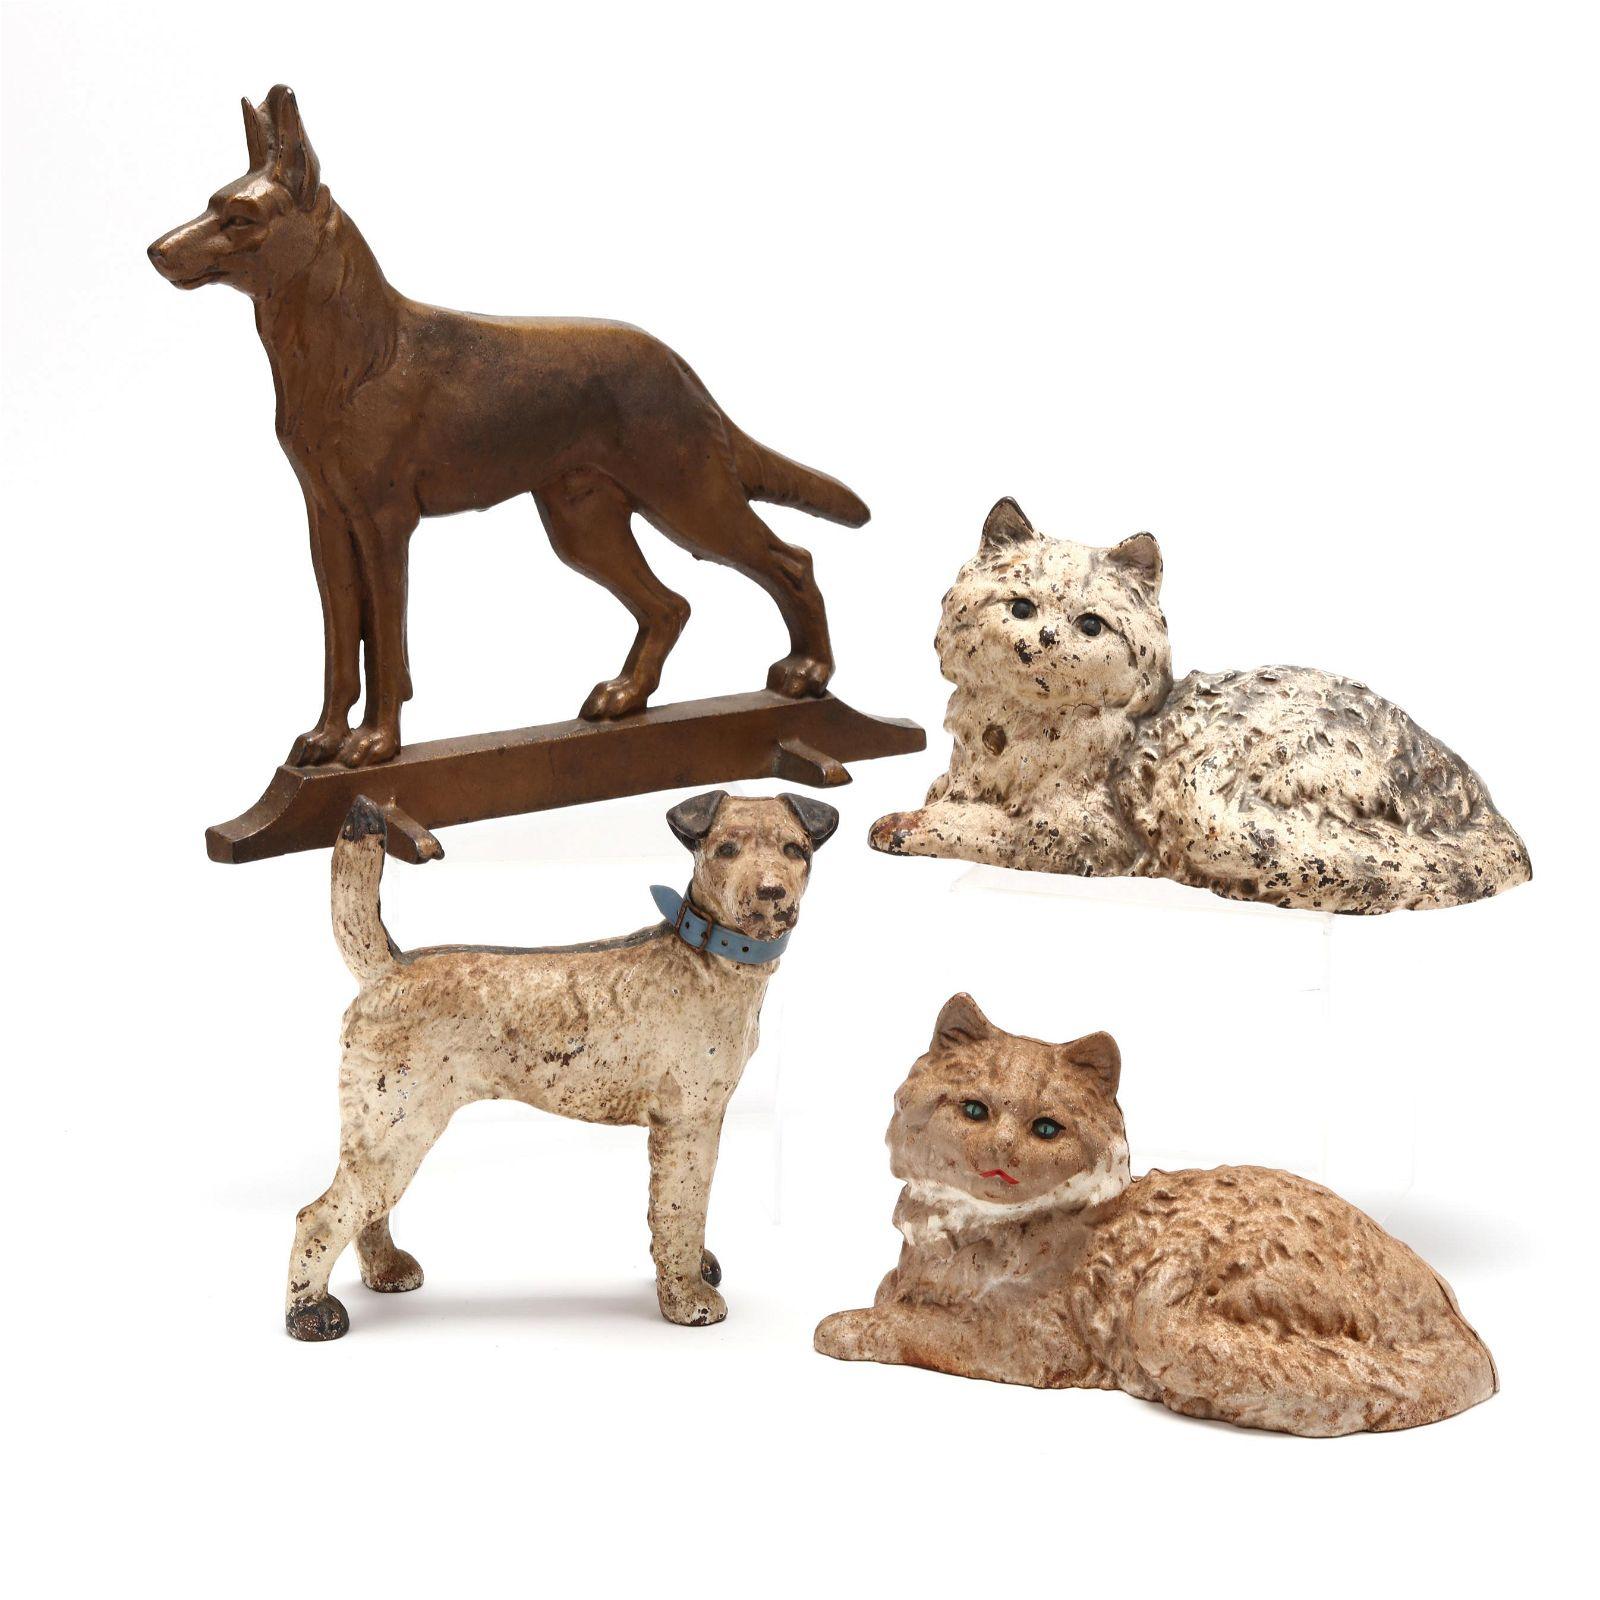 Four Antique Cast Iron Animal Doorstops, including